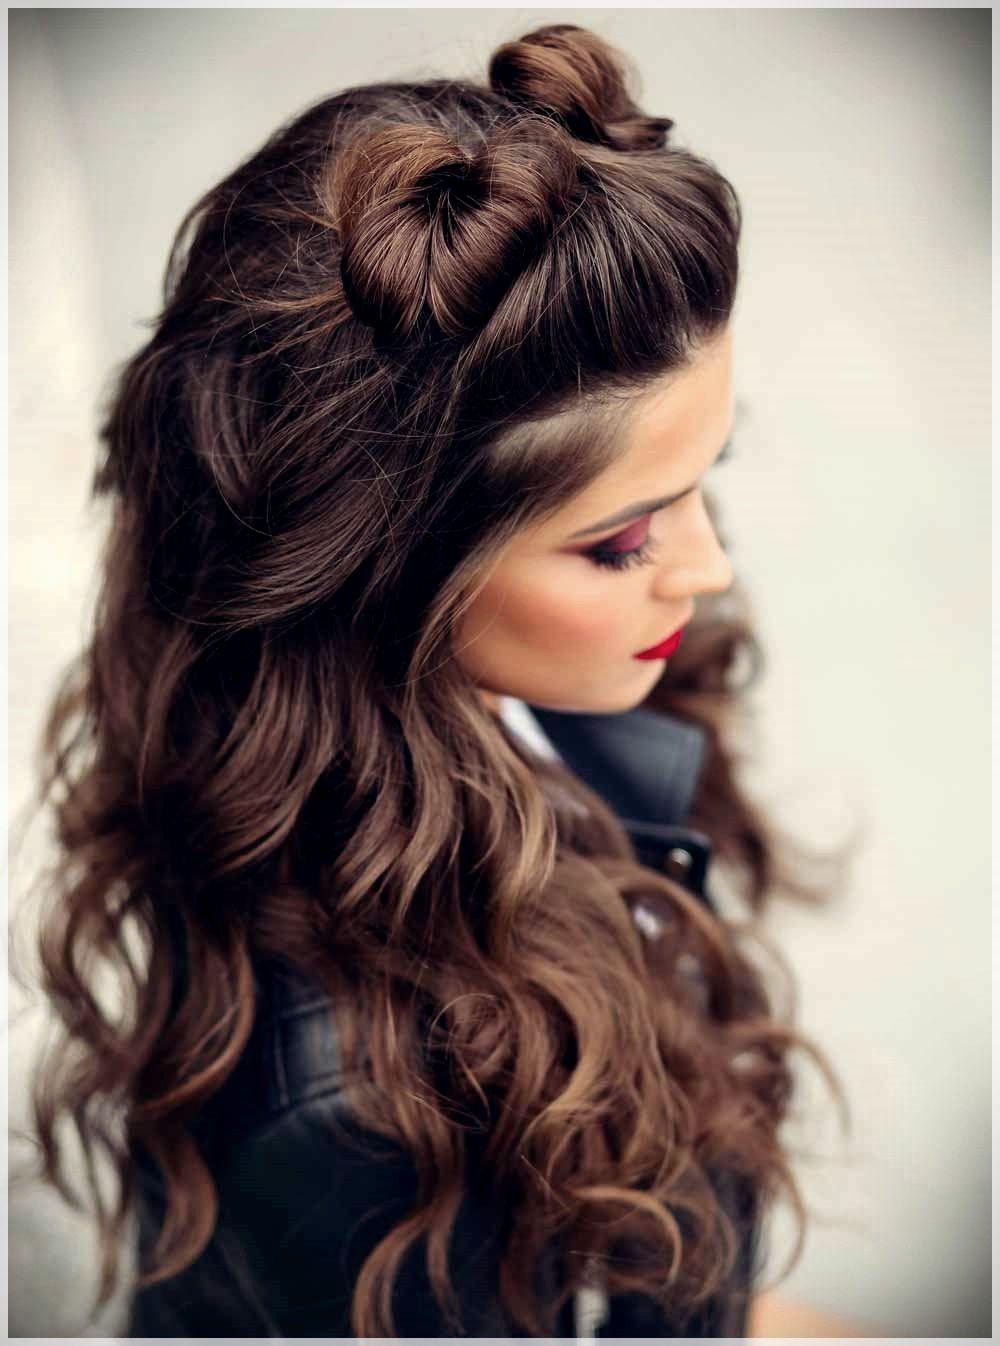 Hairstyles Autumn Winter 2019 Photos And Ideas Blonde Highlights On Dark Hair Hair Styles Dark Hair With Highlights